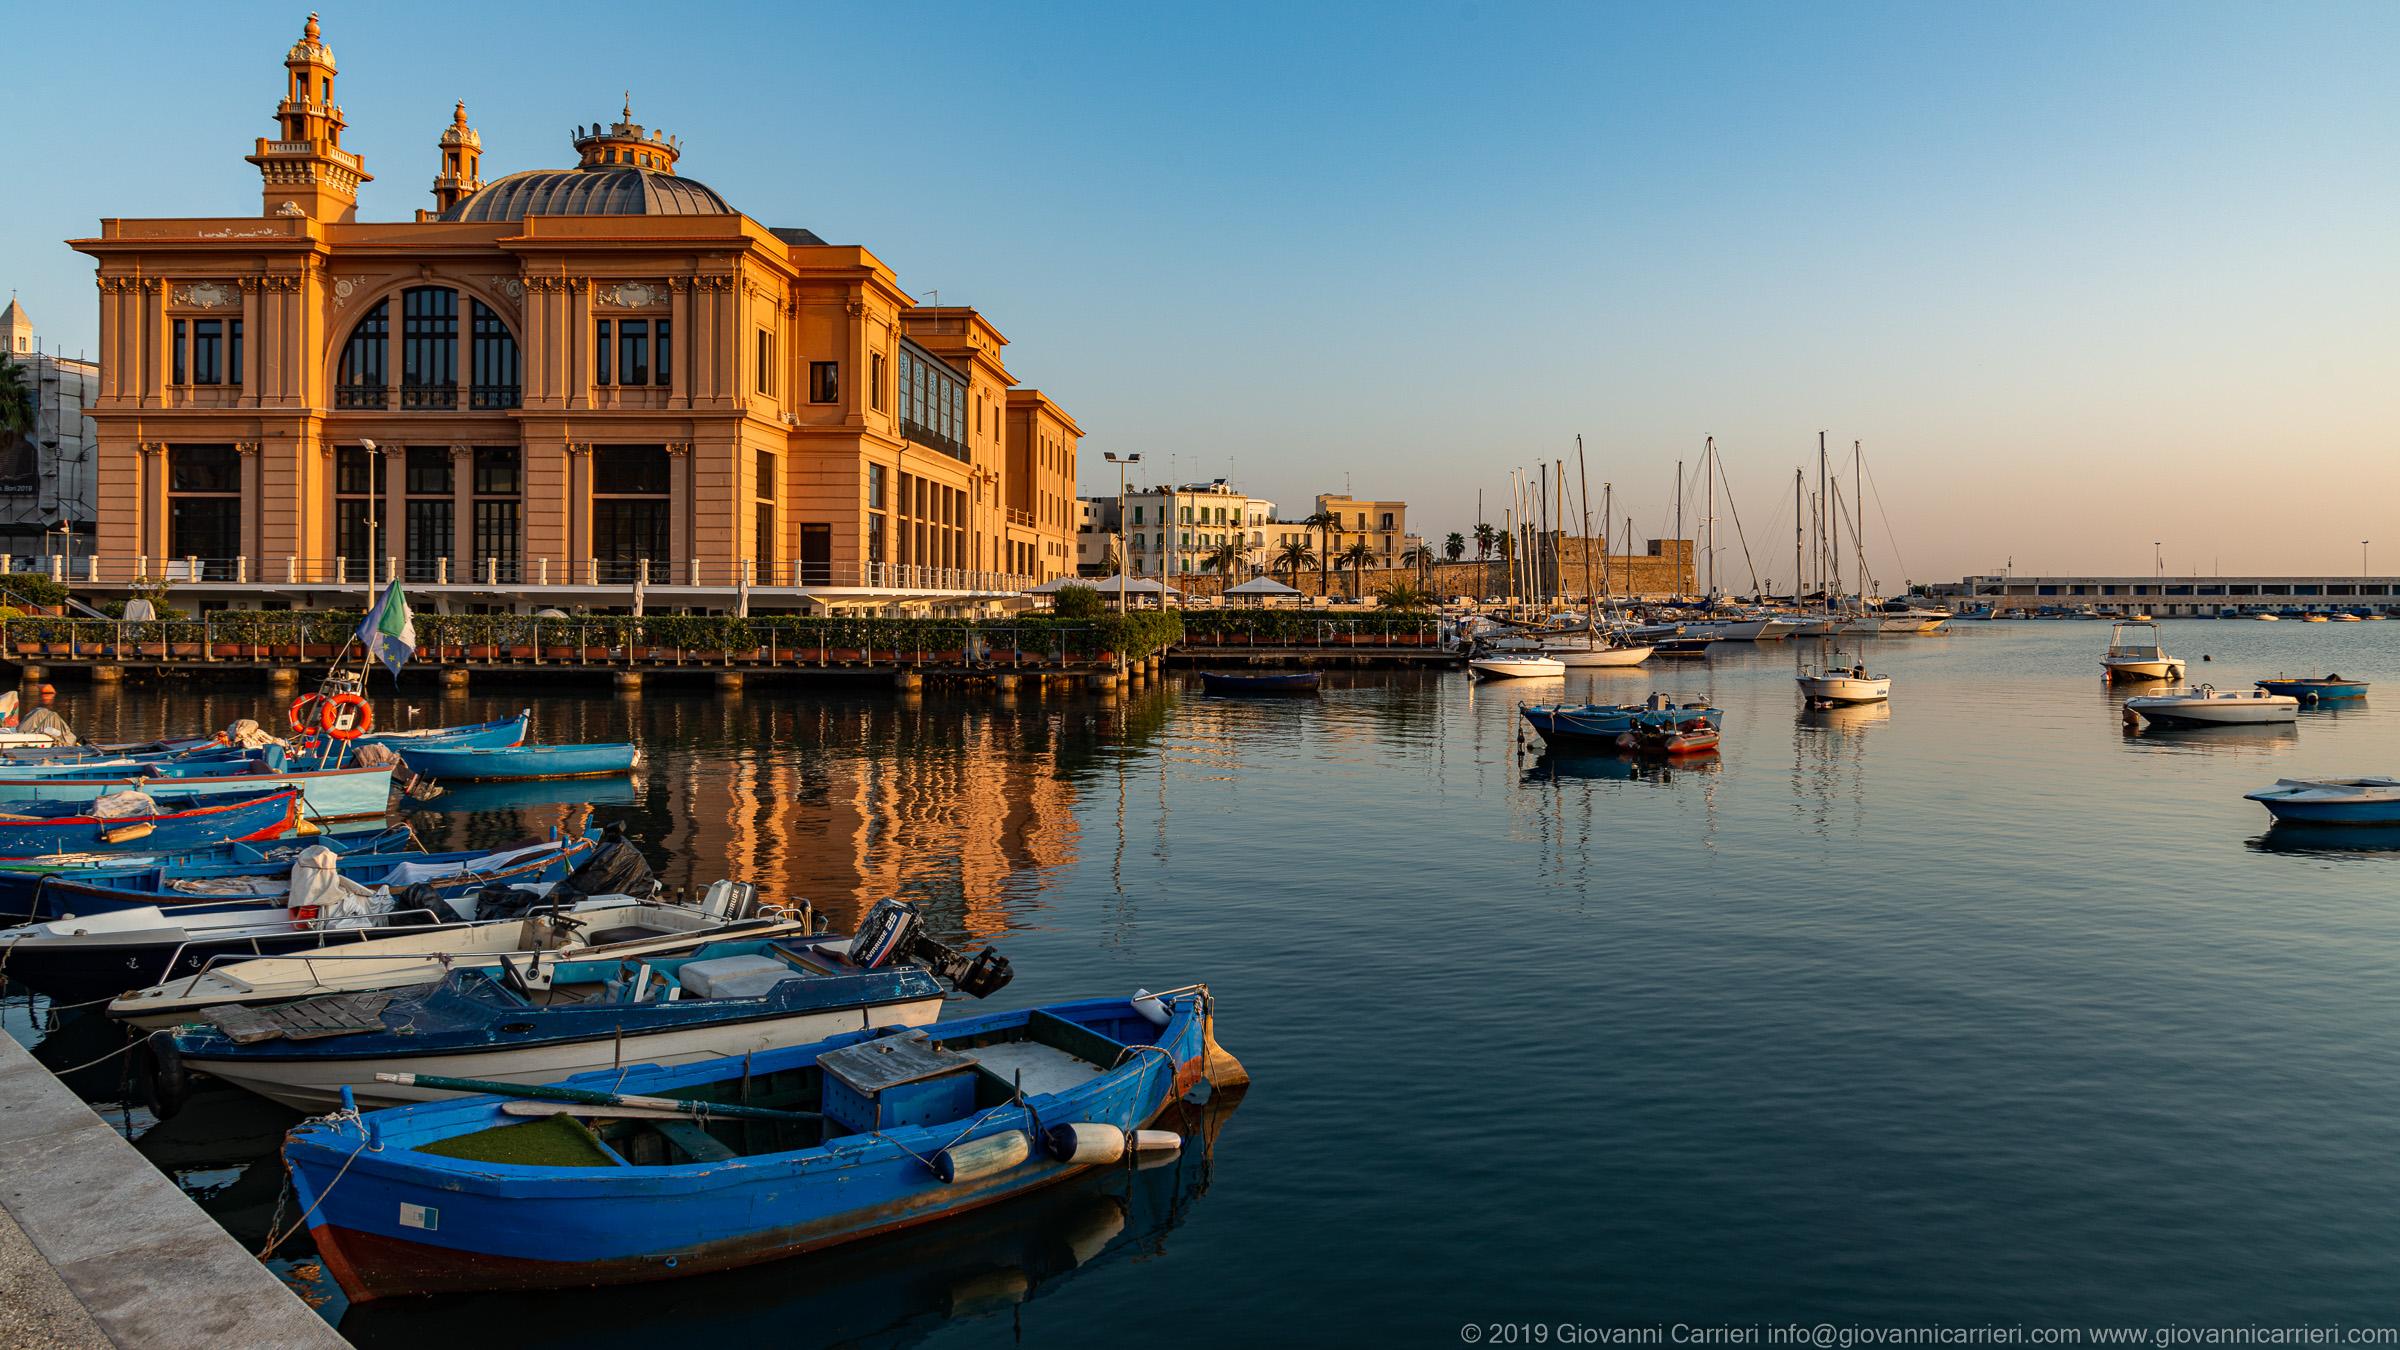 Bari city center